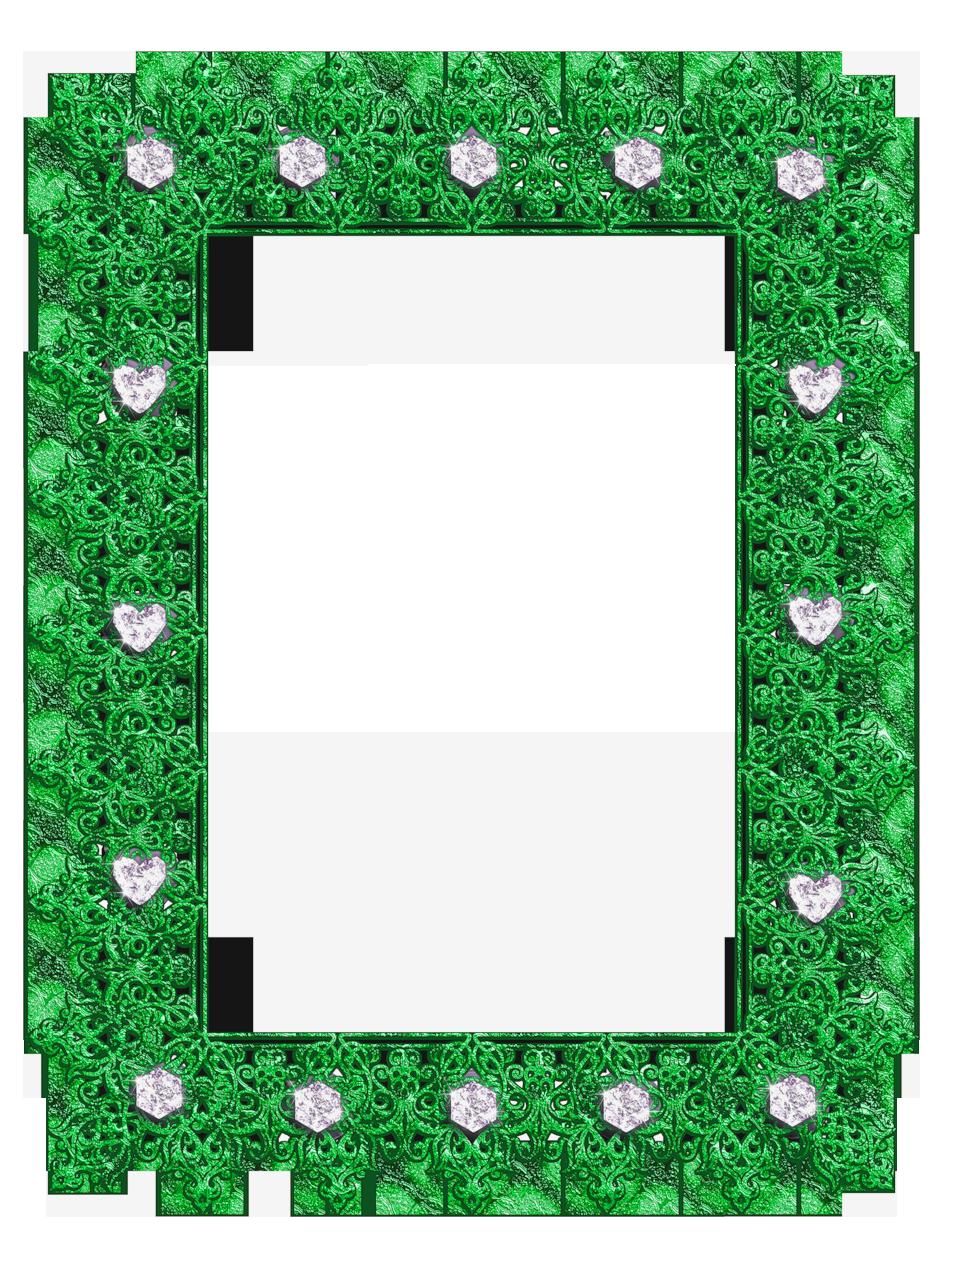 Trendy pumpkin clipart border vector freeuse stock Green Transparent Frame with Diamonds | Frames | Pinterest vector freeuse stock